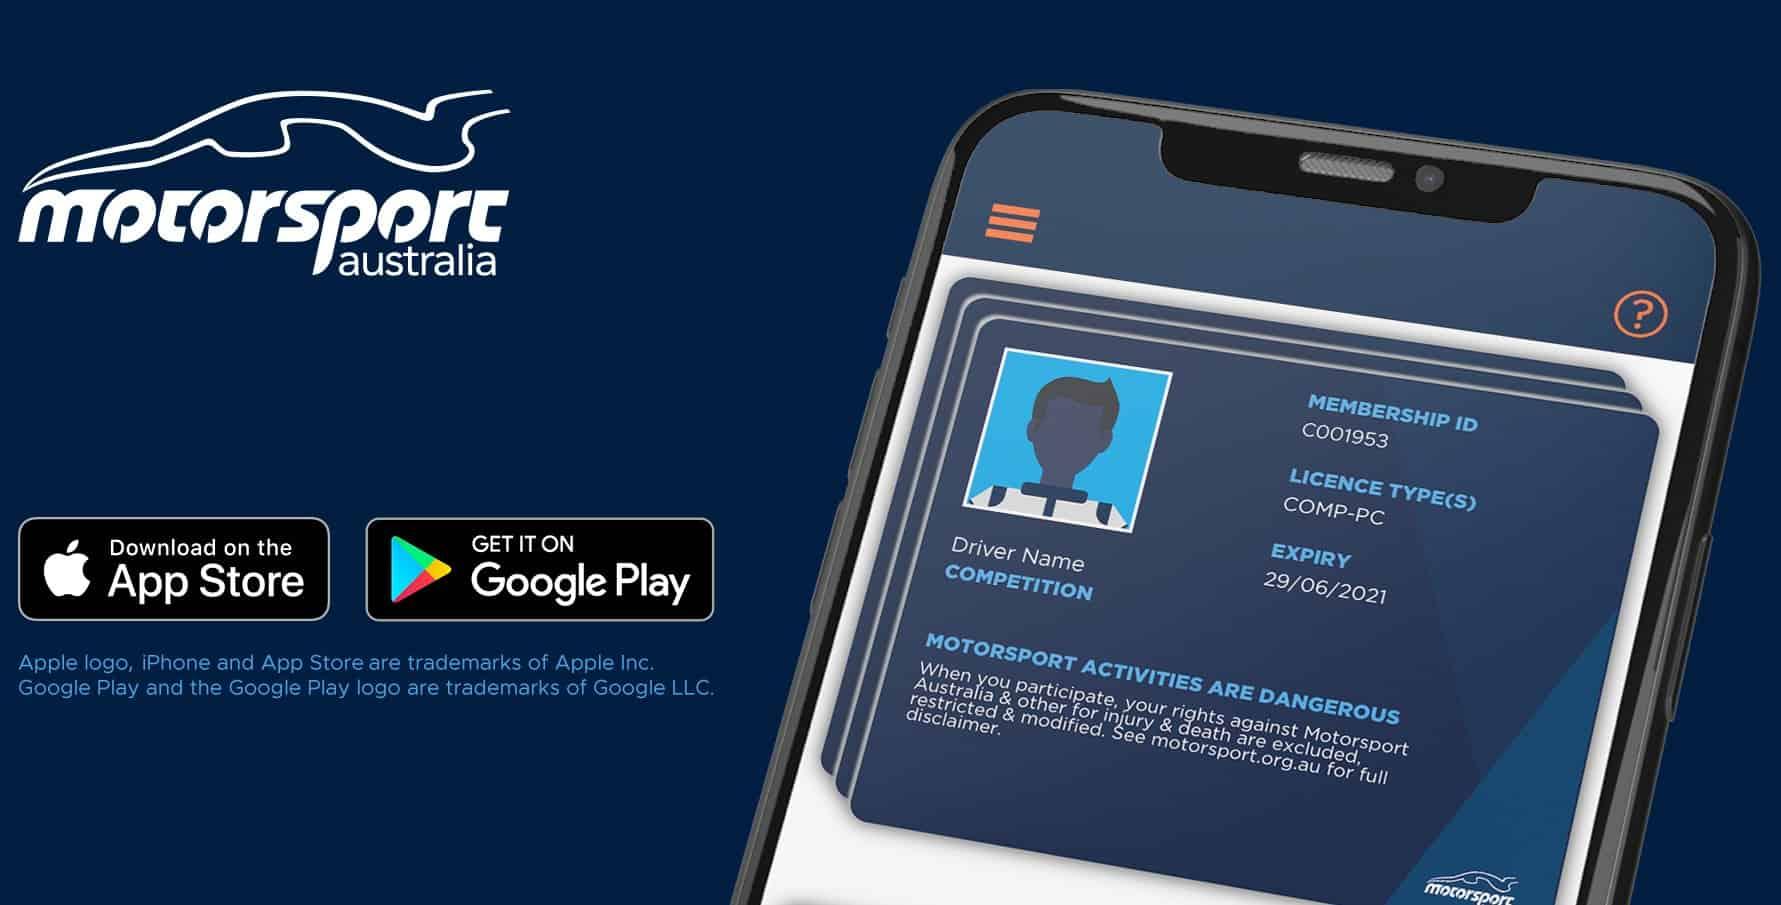 Motorsport Australia App for Track Days